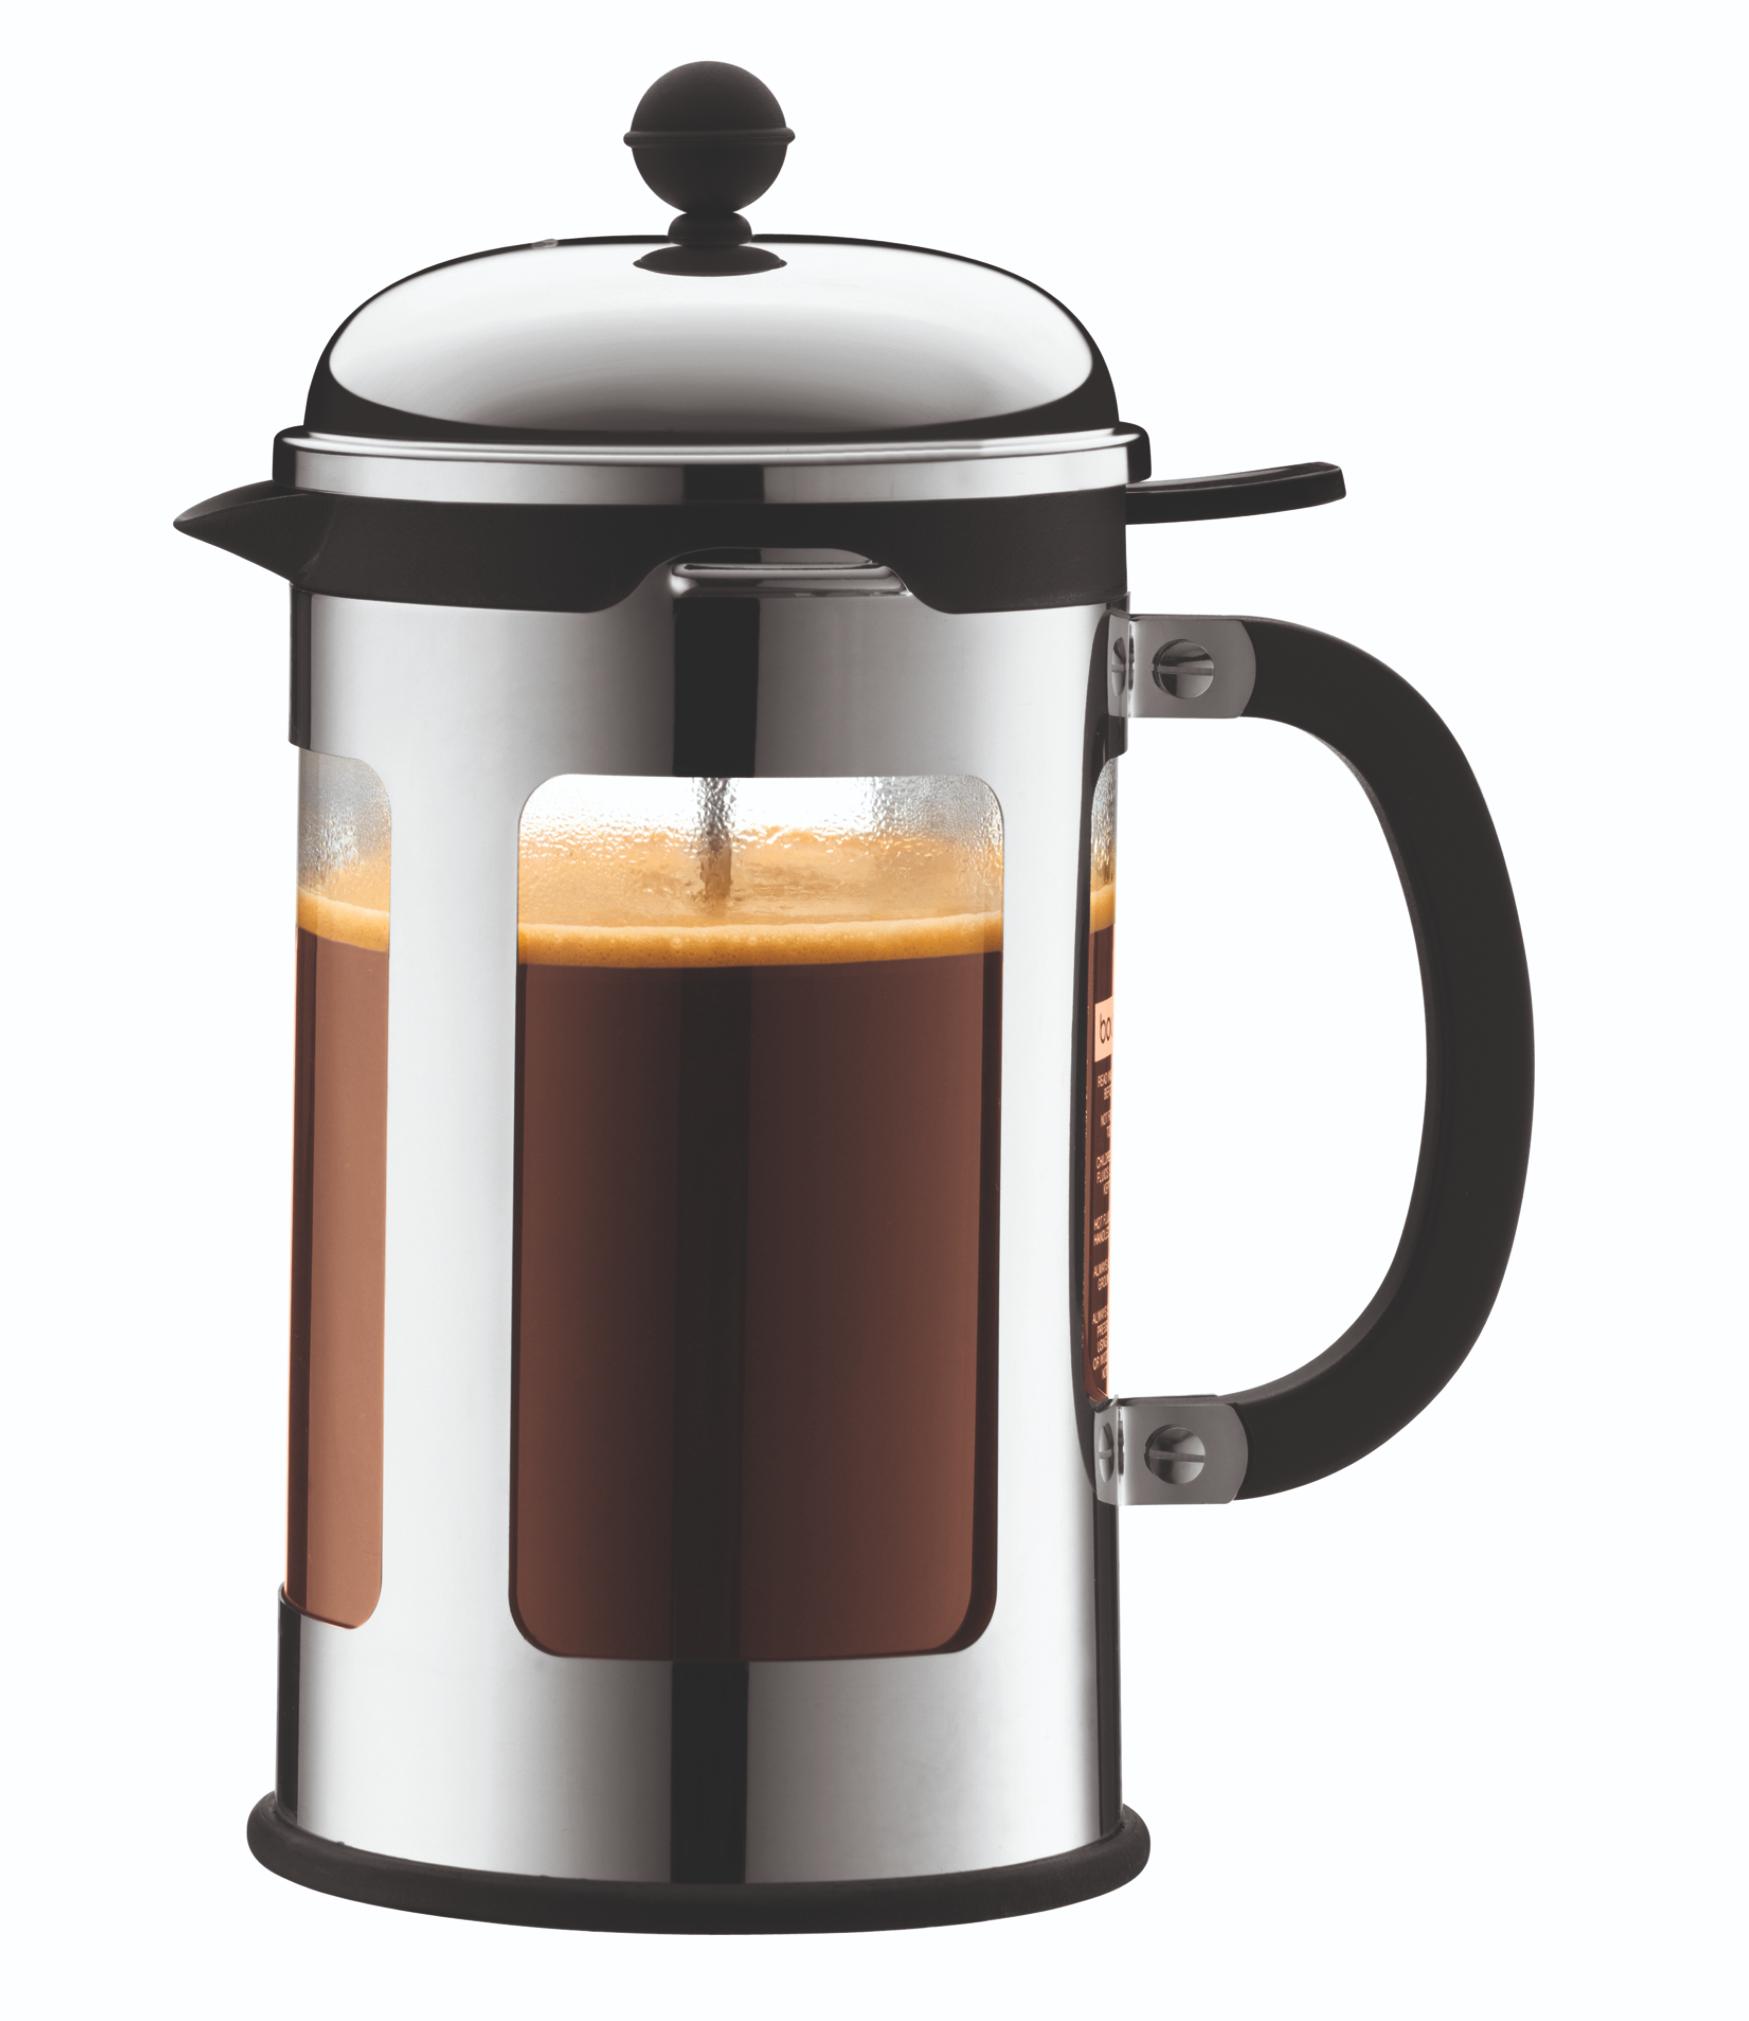 Bodum Cafeti?re Chambord RVS 1.5 Liter